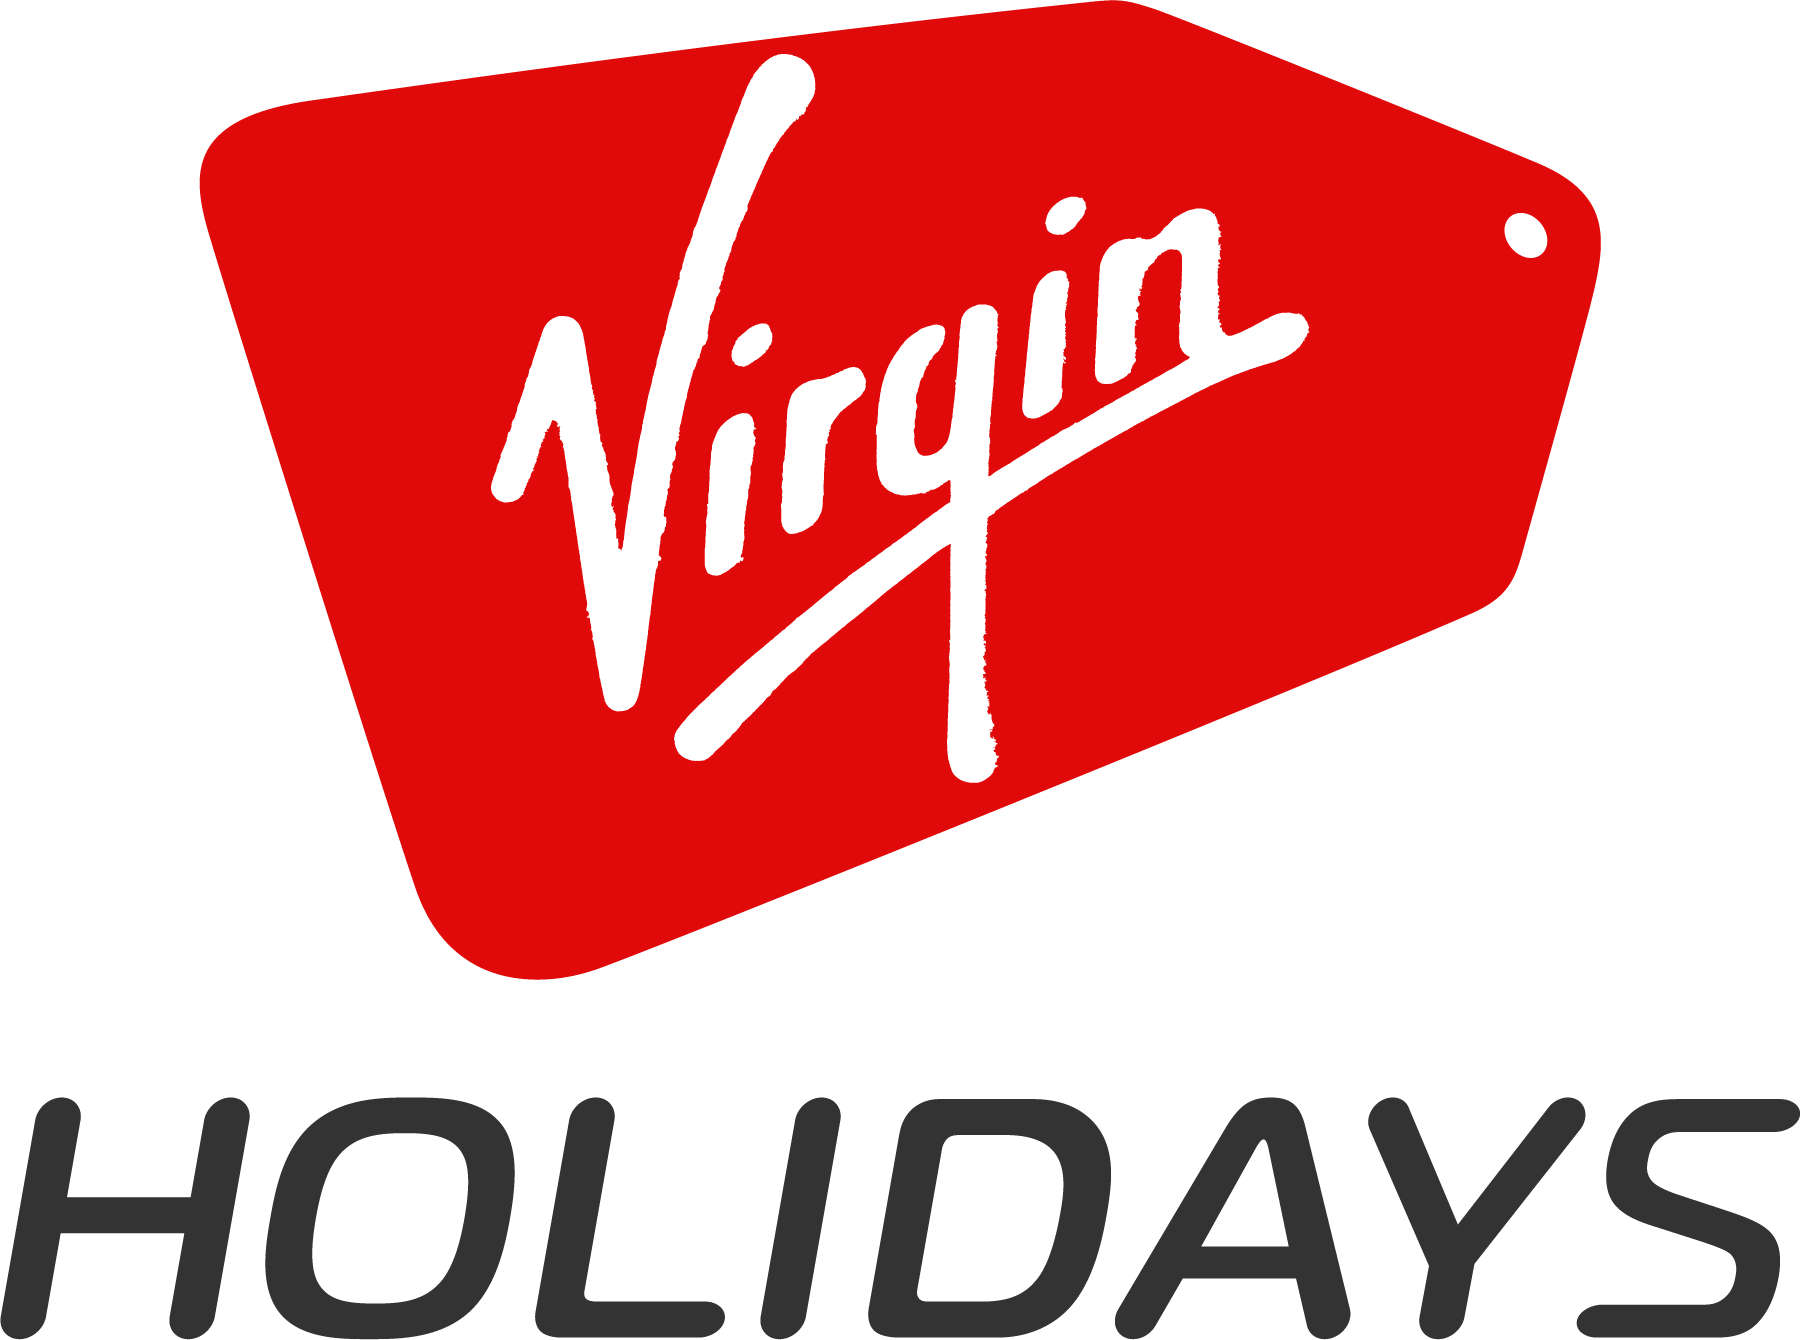 Virgin Holidays Leeds Trinity